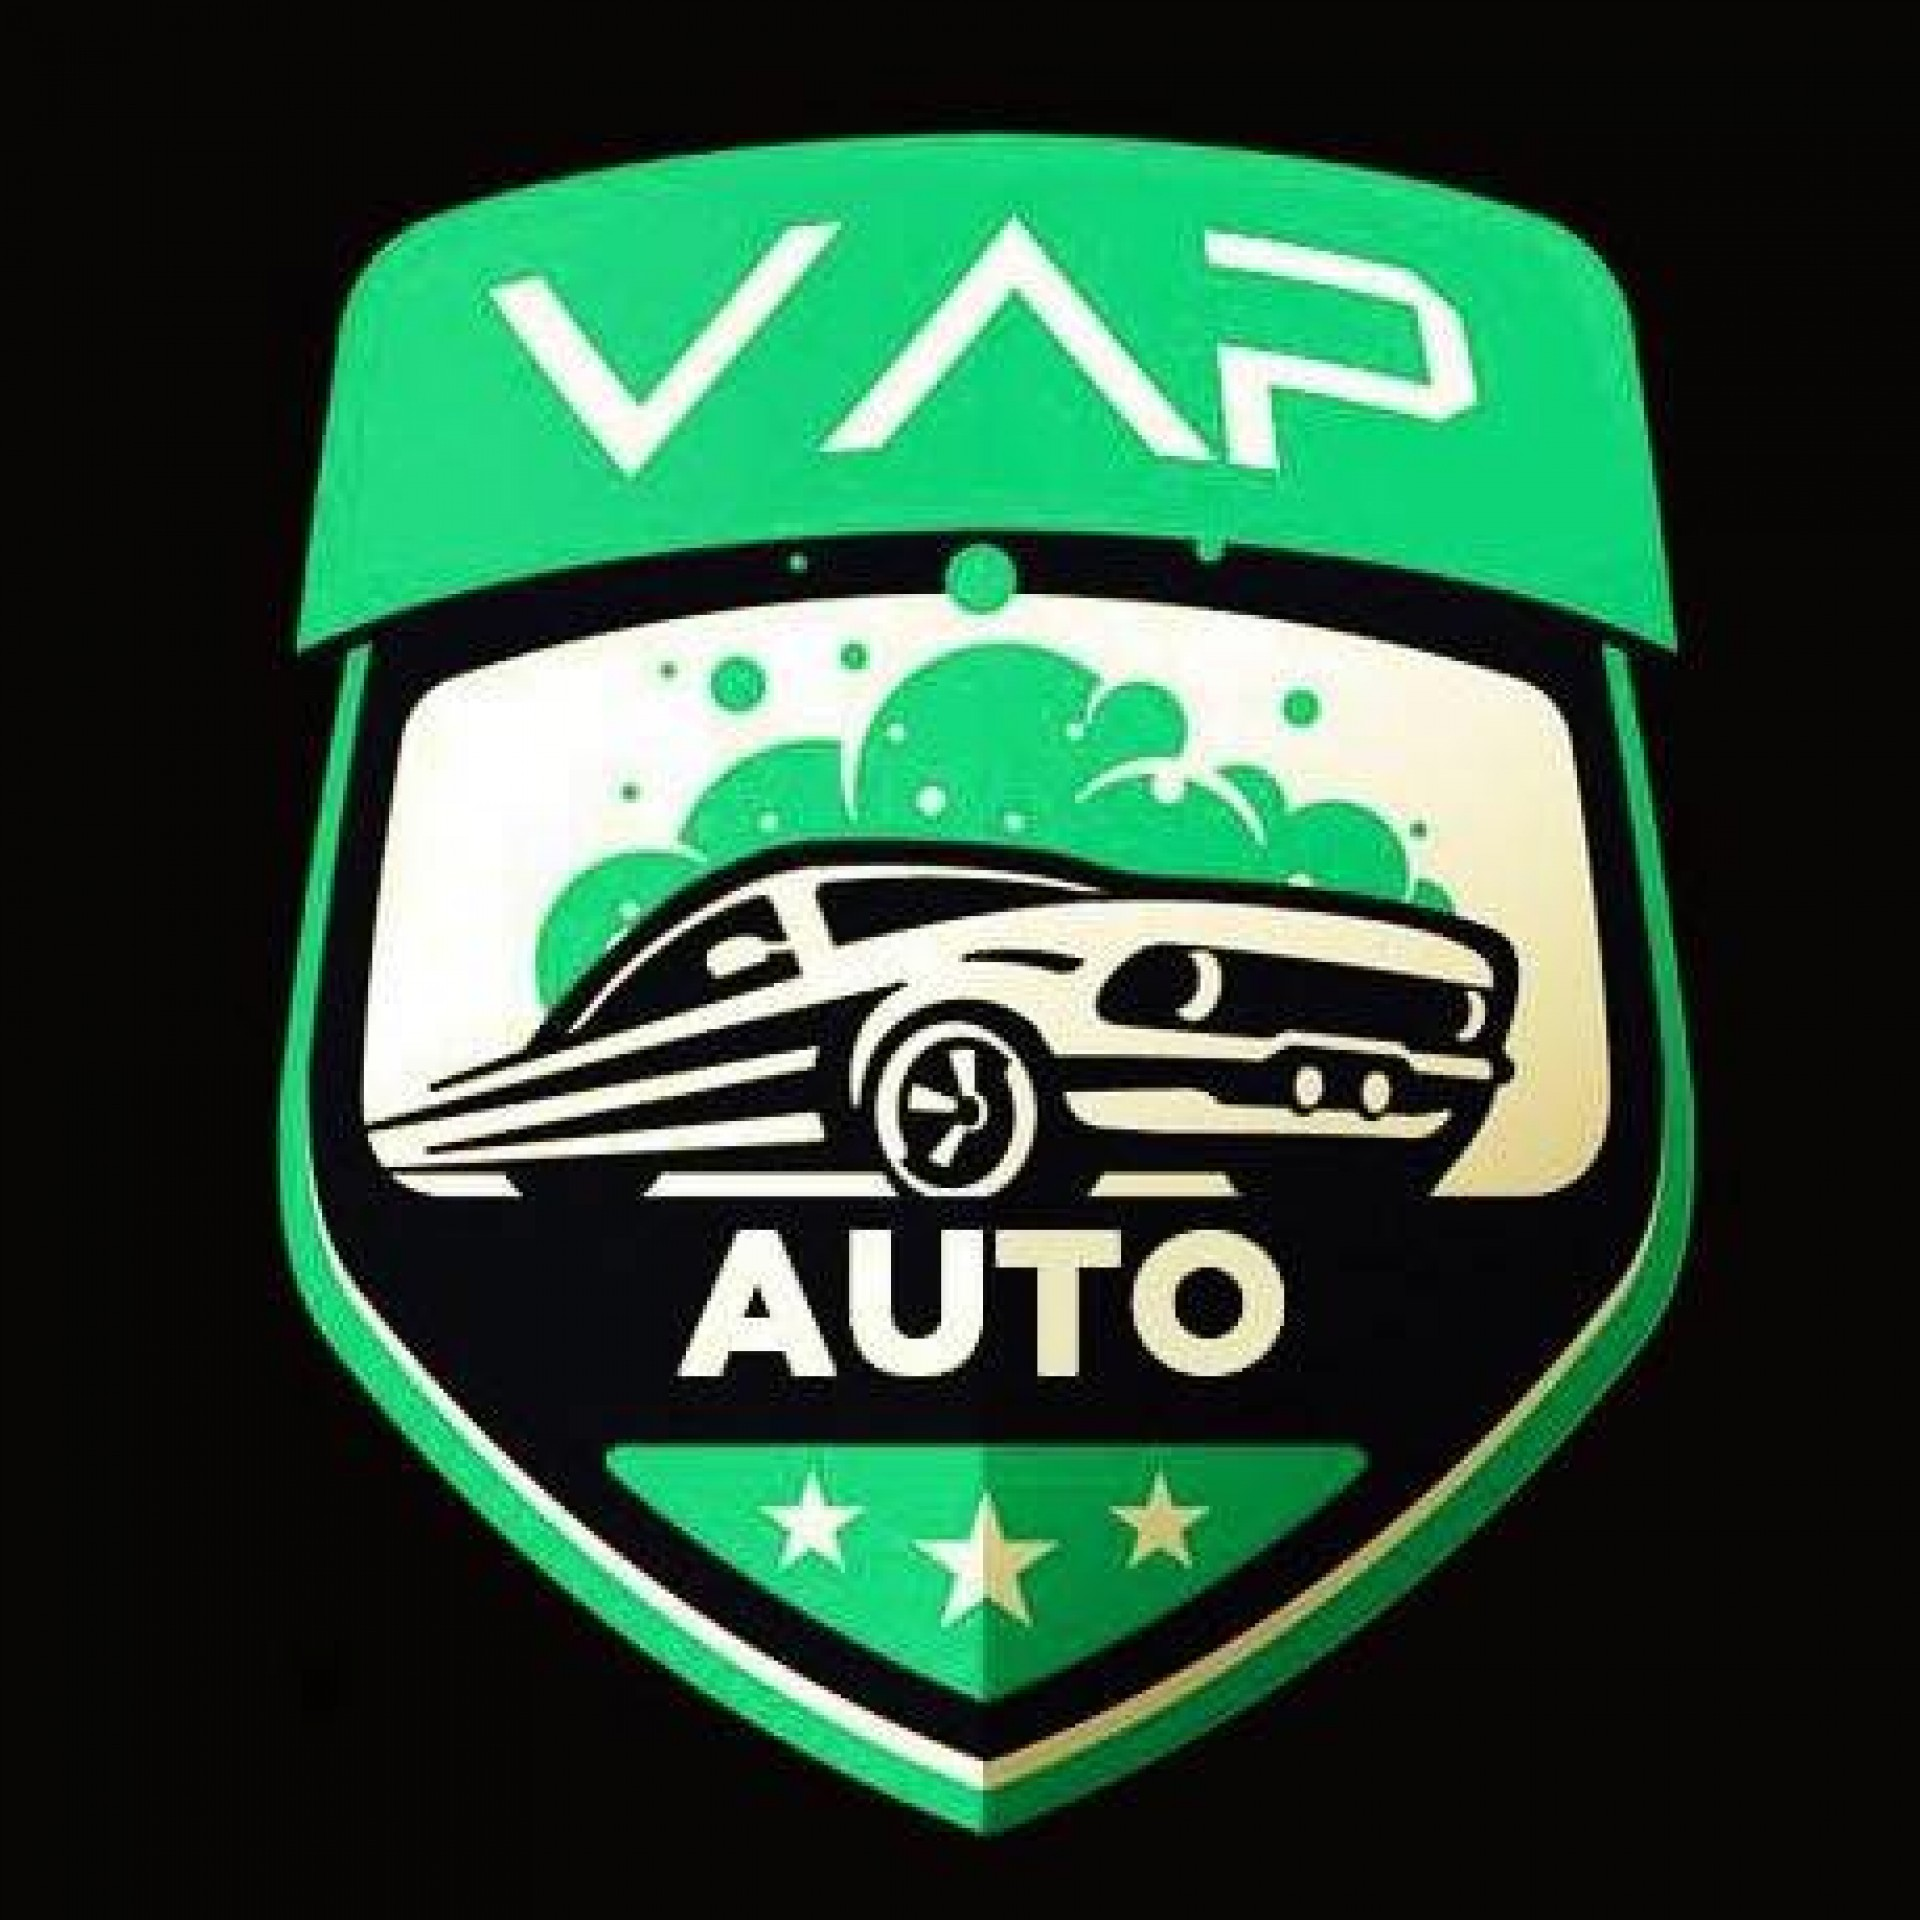 Vapauto logo